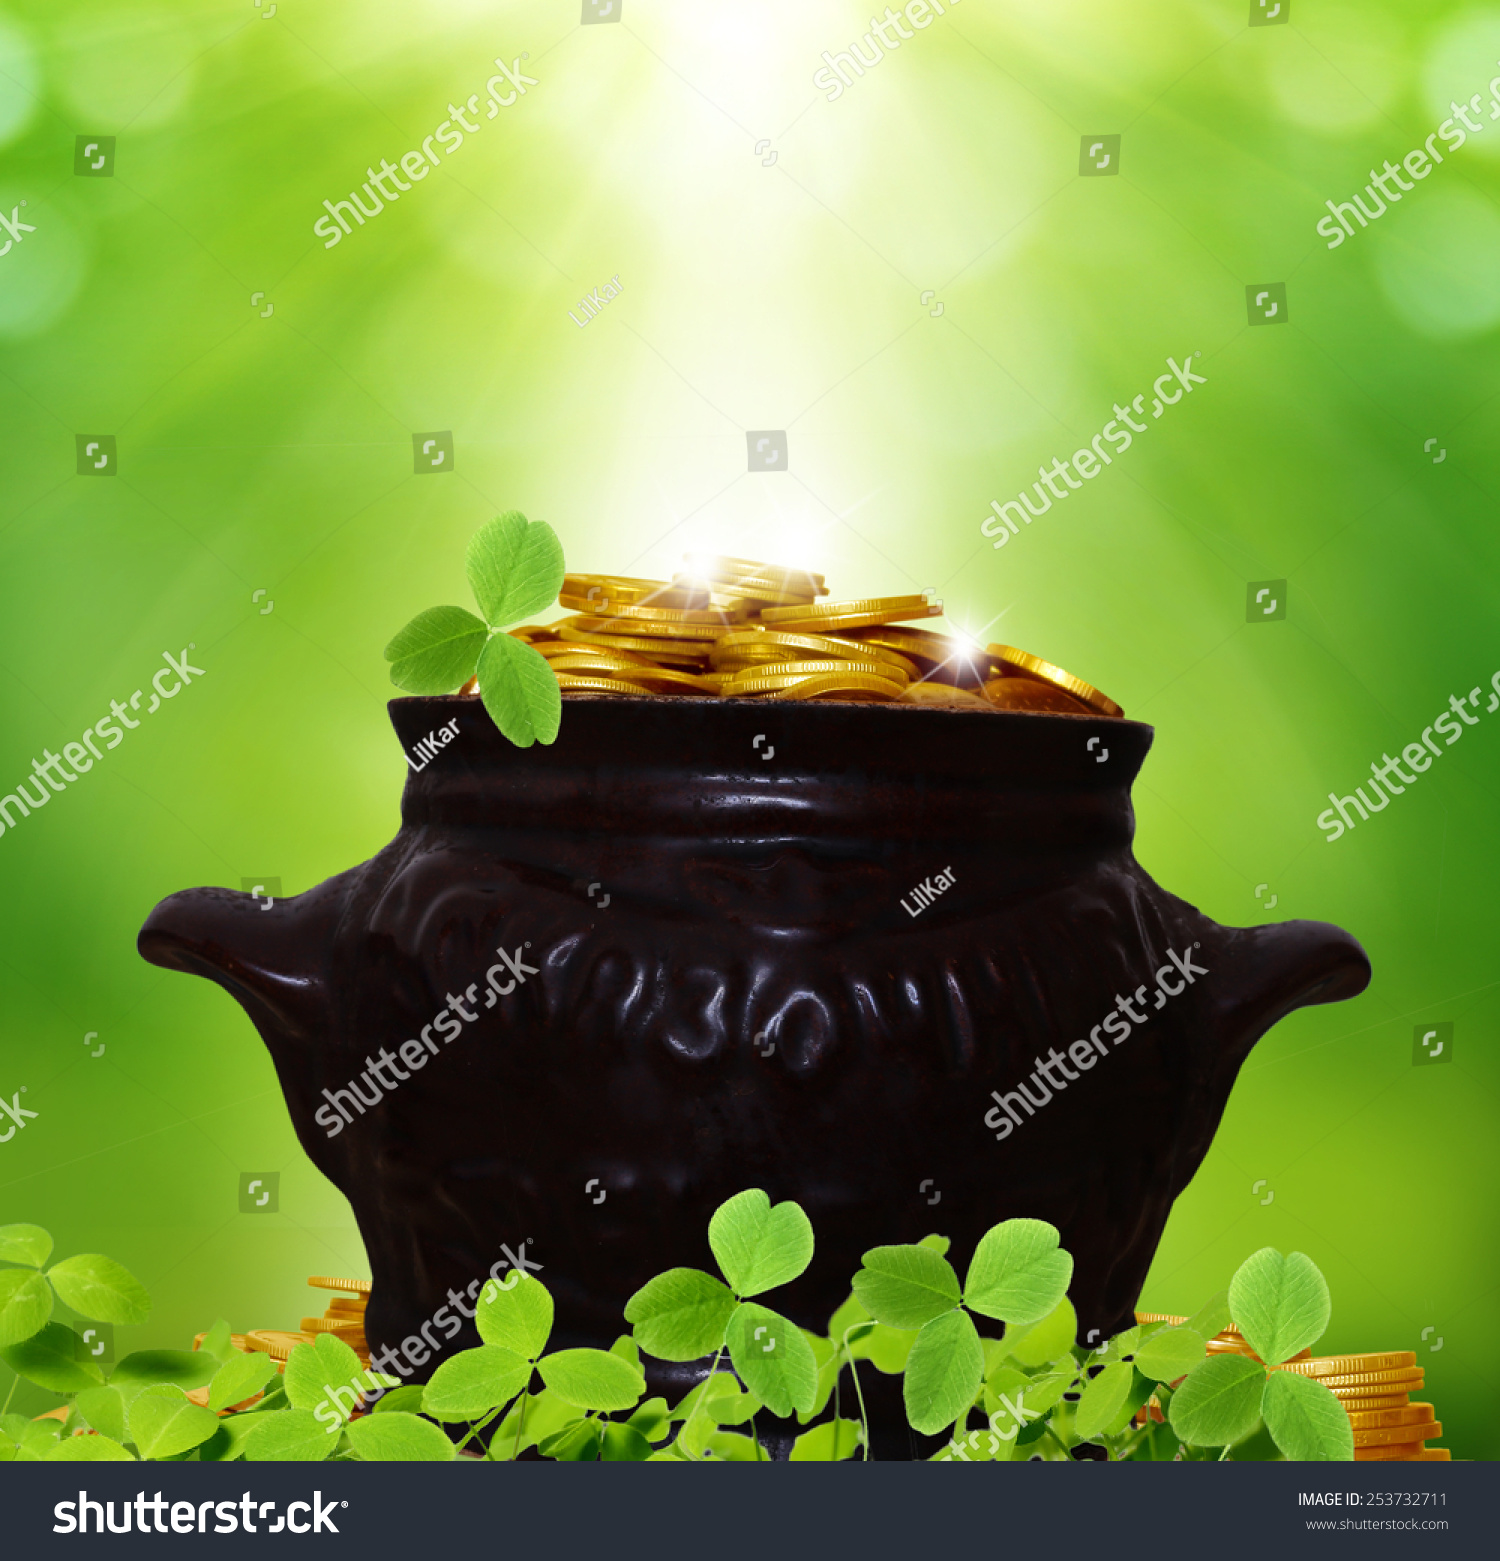 St Patricks Day Background Stock Photo 253732711 1500x1561